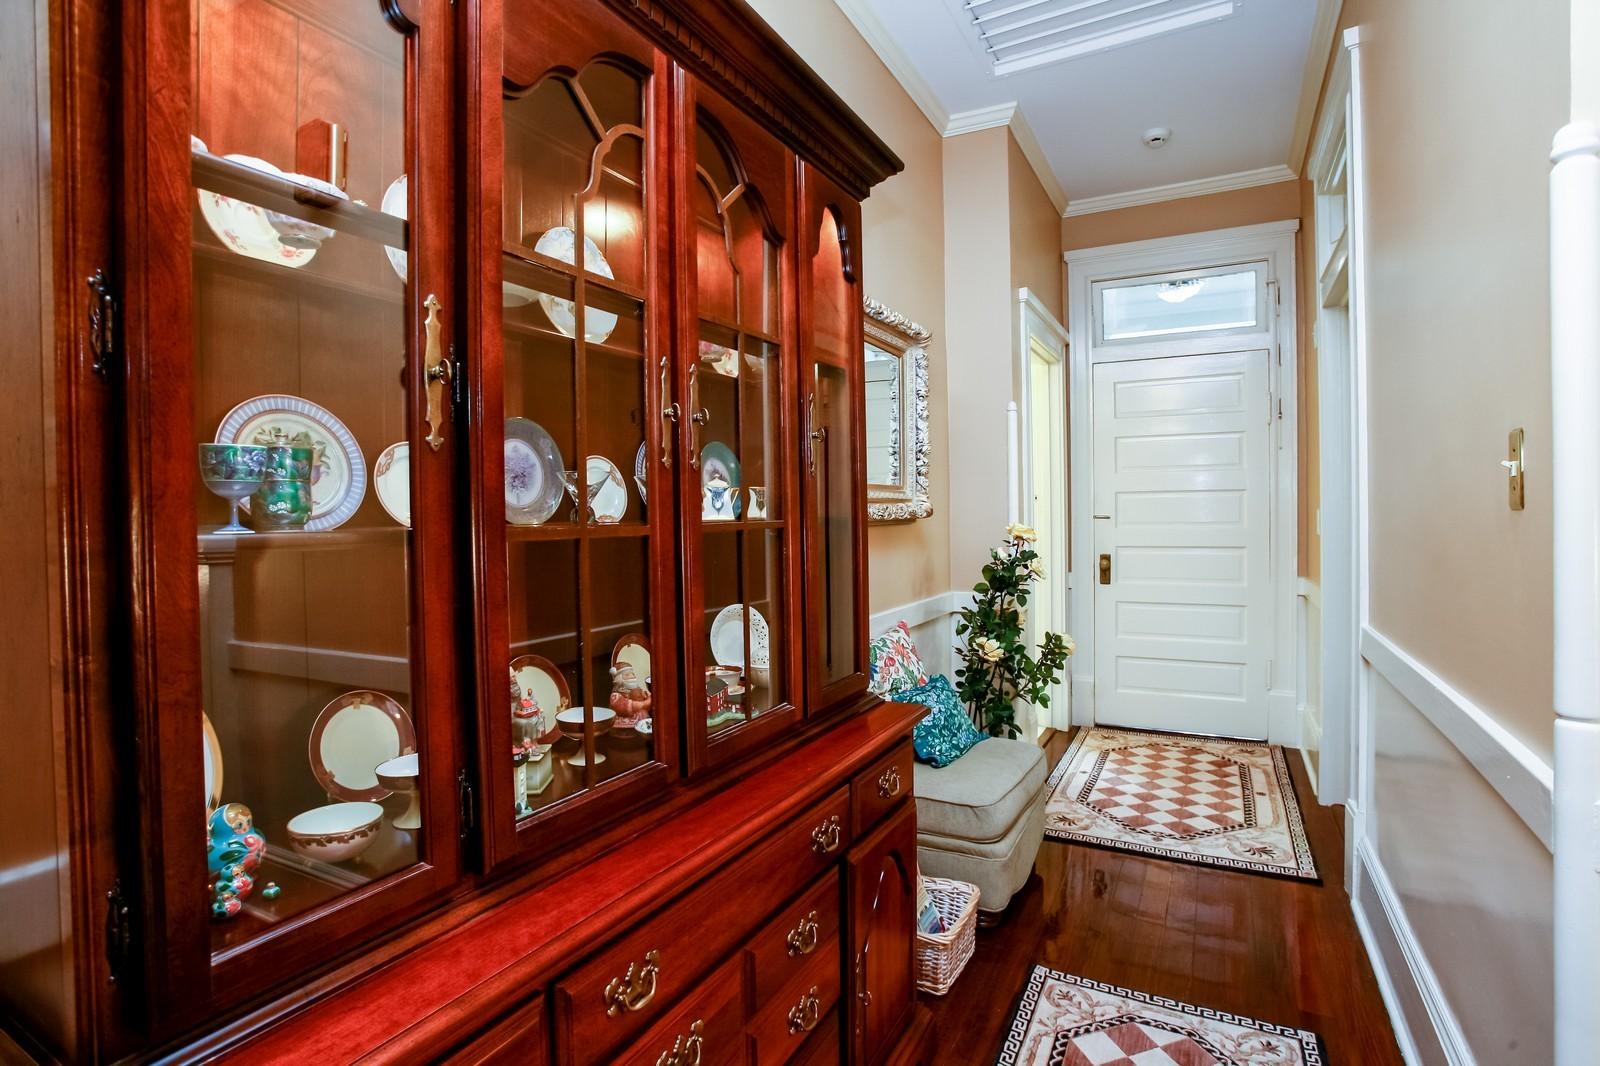 Real Estate Photography - 414 N 14th St, Lanett, AL, 36863 - Hallway